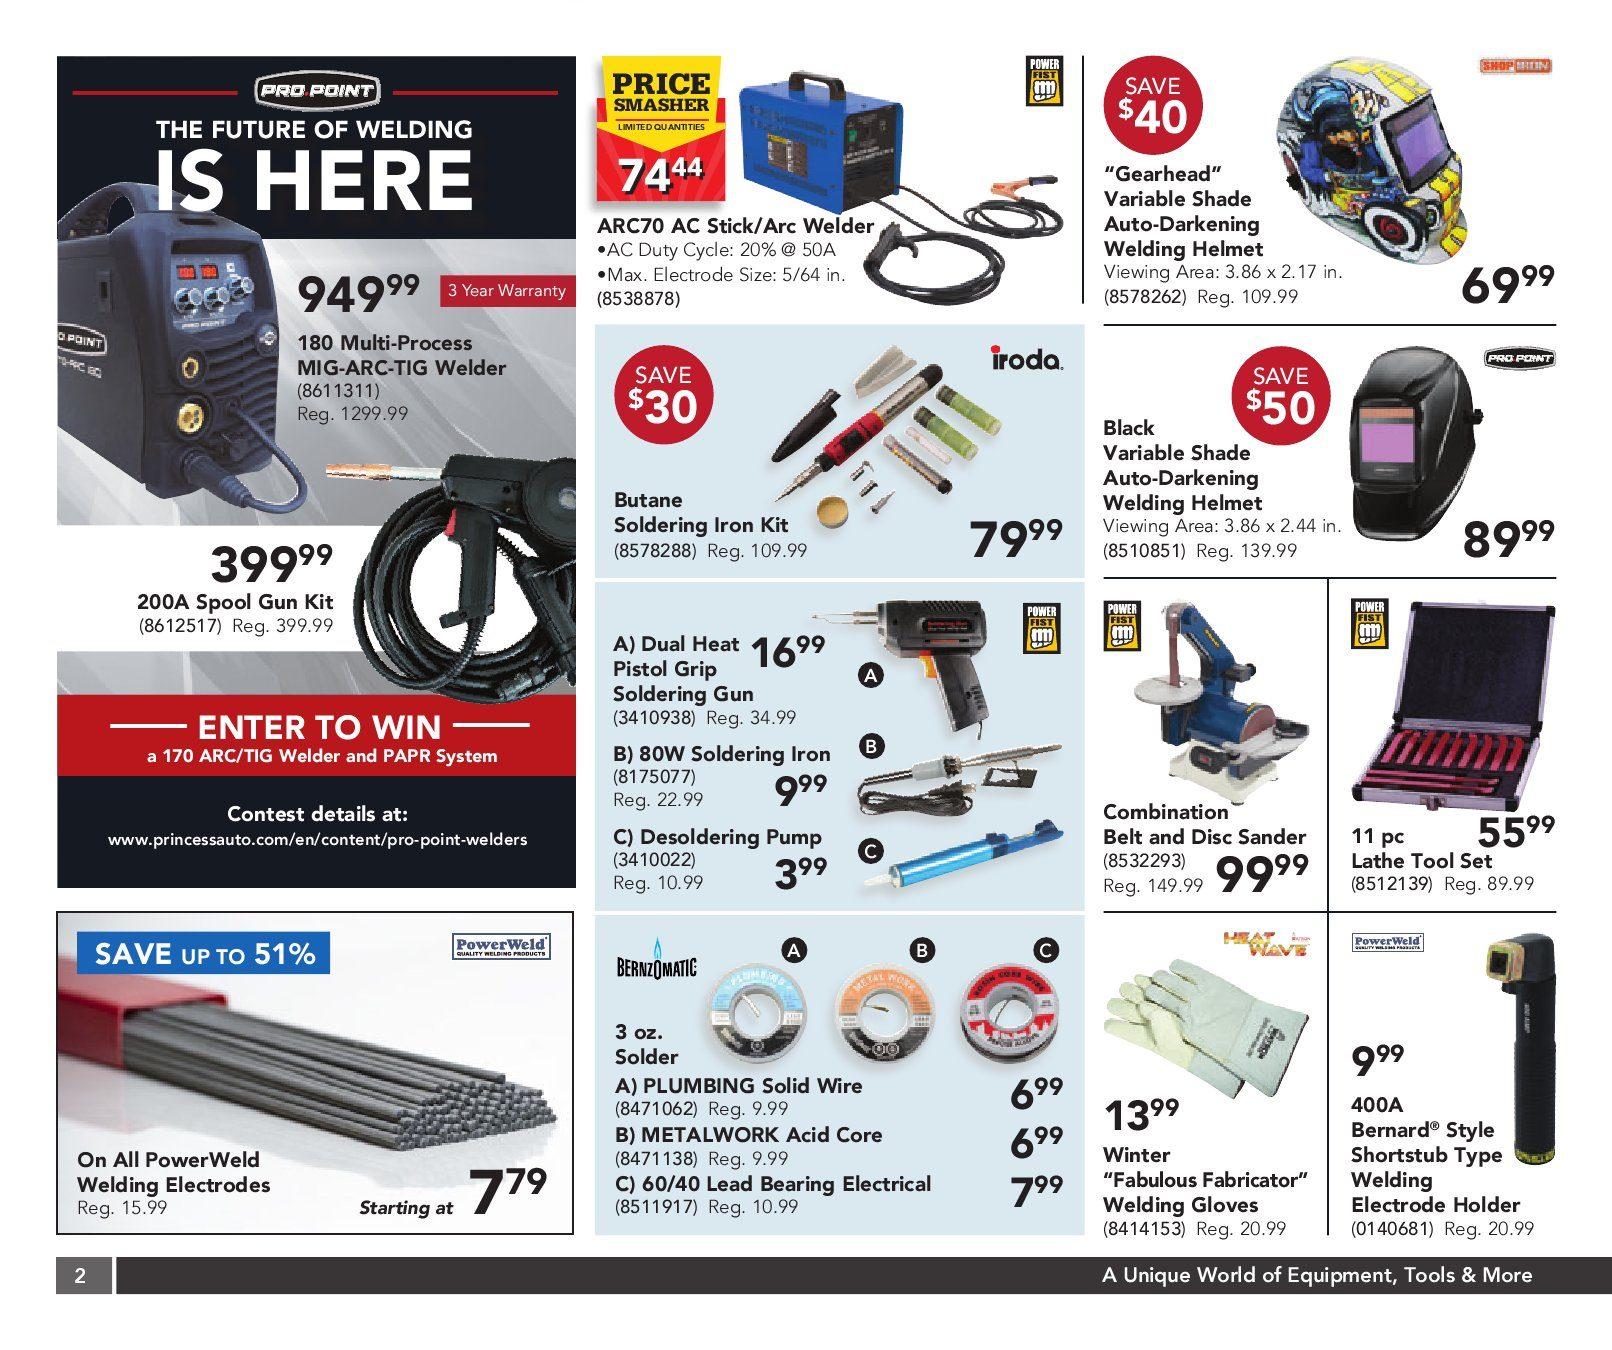 Princess Auto Weekly Flyer 2 Week Sale Gifts For Your Garage En Garbage Disposal Dishwasher Wiring On Welder Nov 3 15